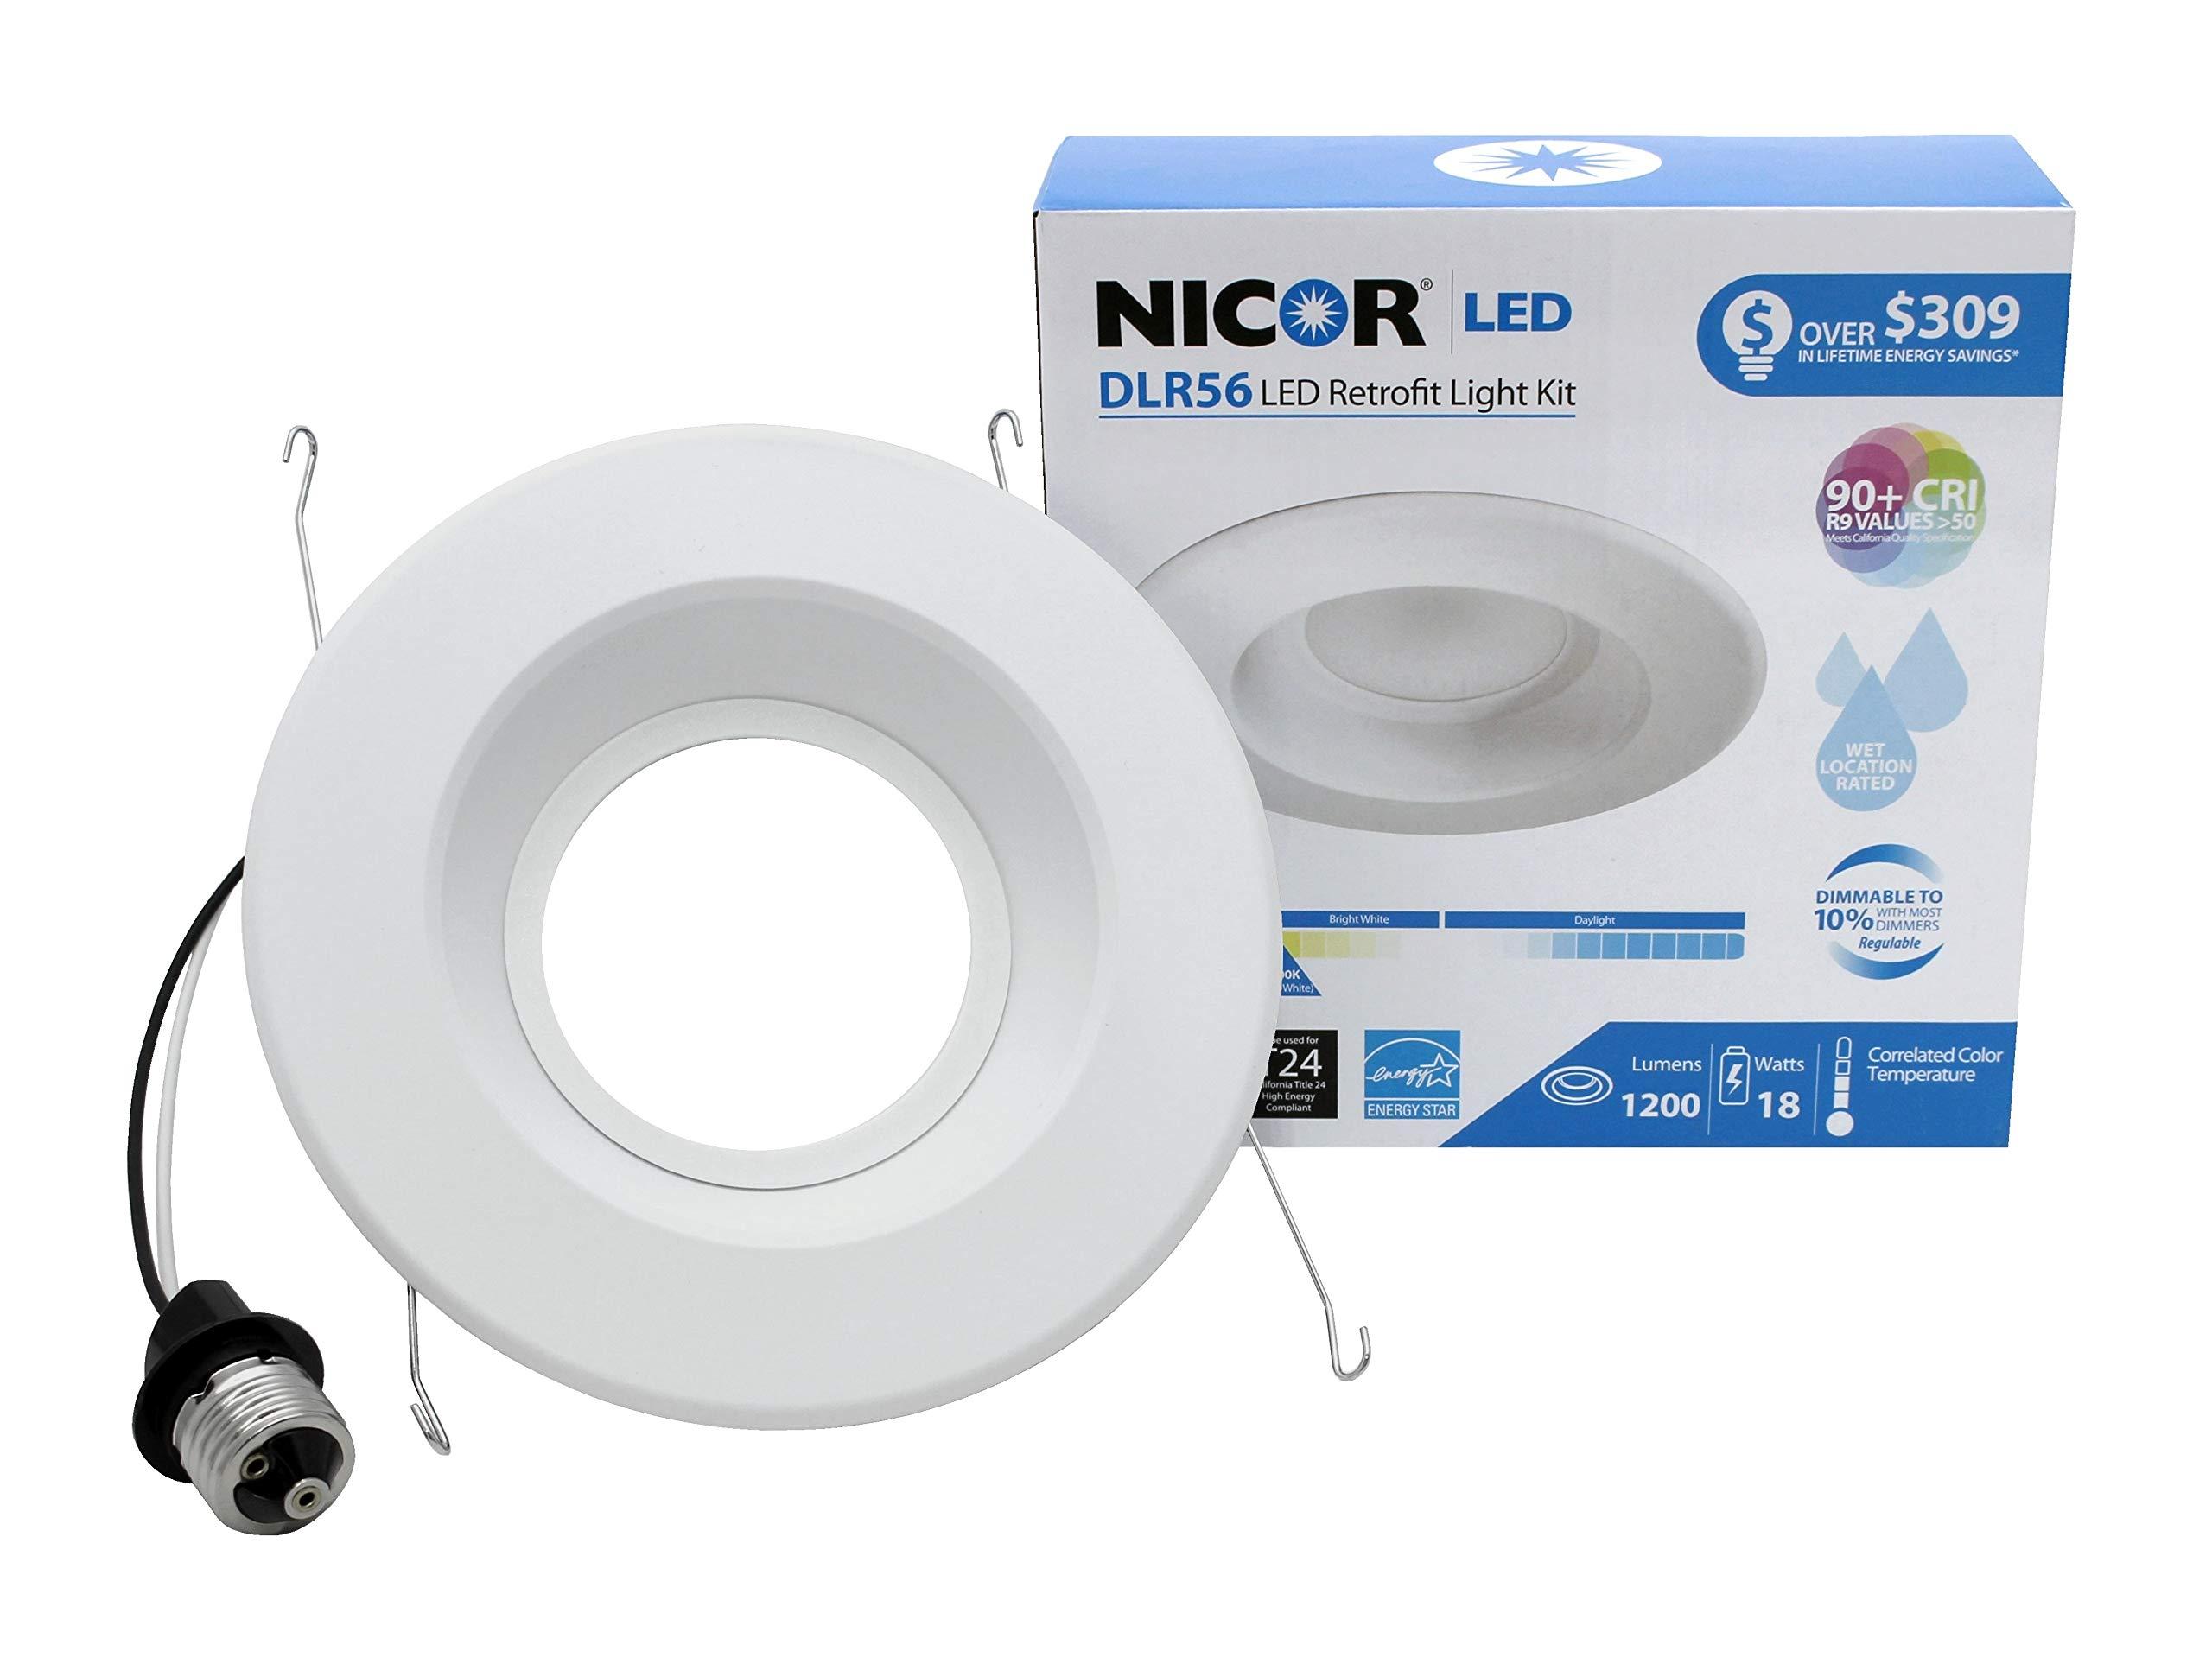 NICOR Lighting 5/6-Inch Dimmable 1200-Lumen 5000K LED Downlight Retrofit Kit for Recessed Housings, White Trim (DLR56-3012-120-5K-WH)